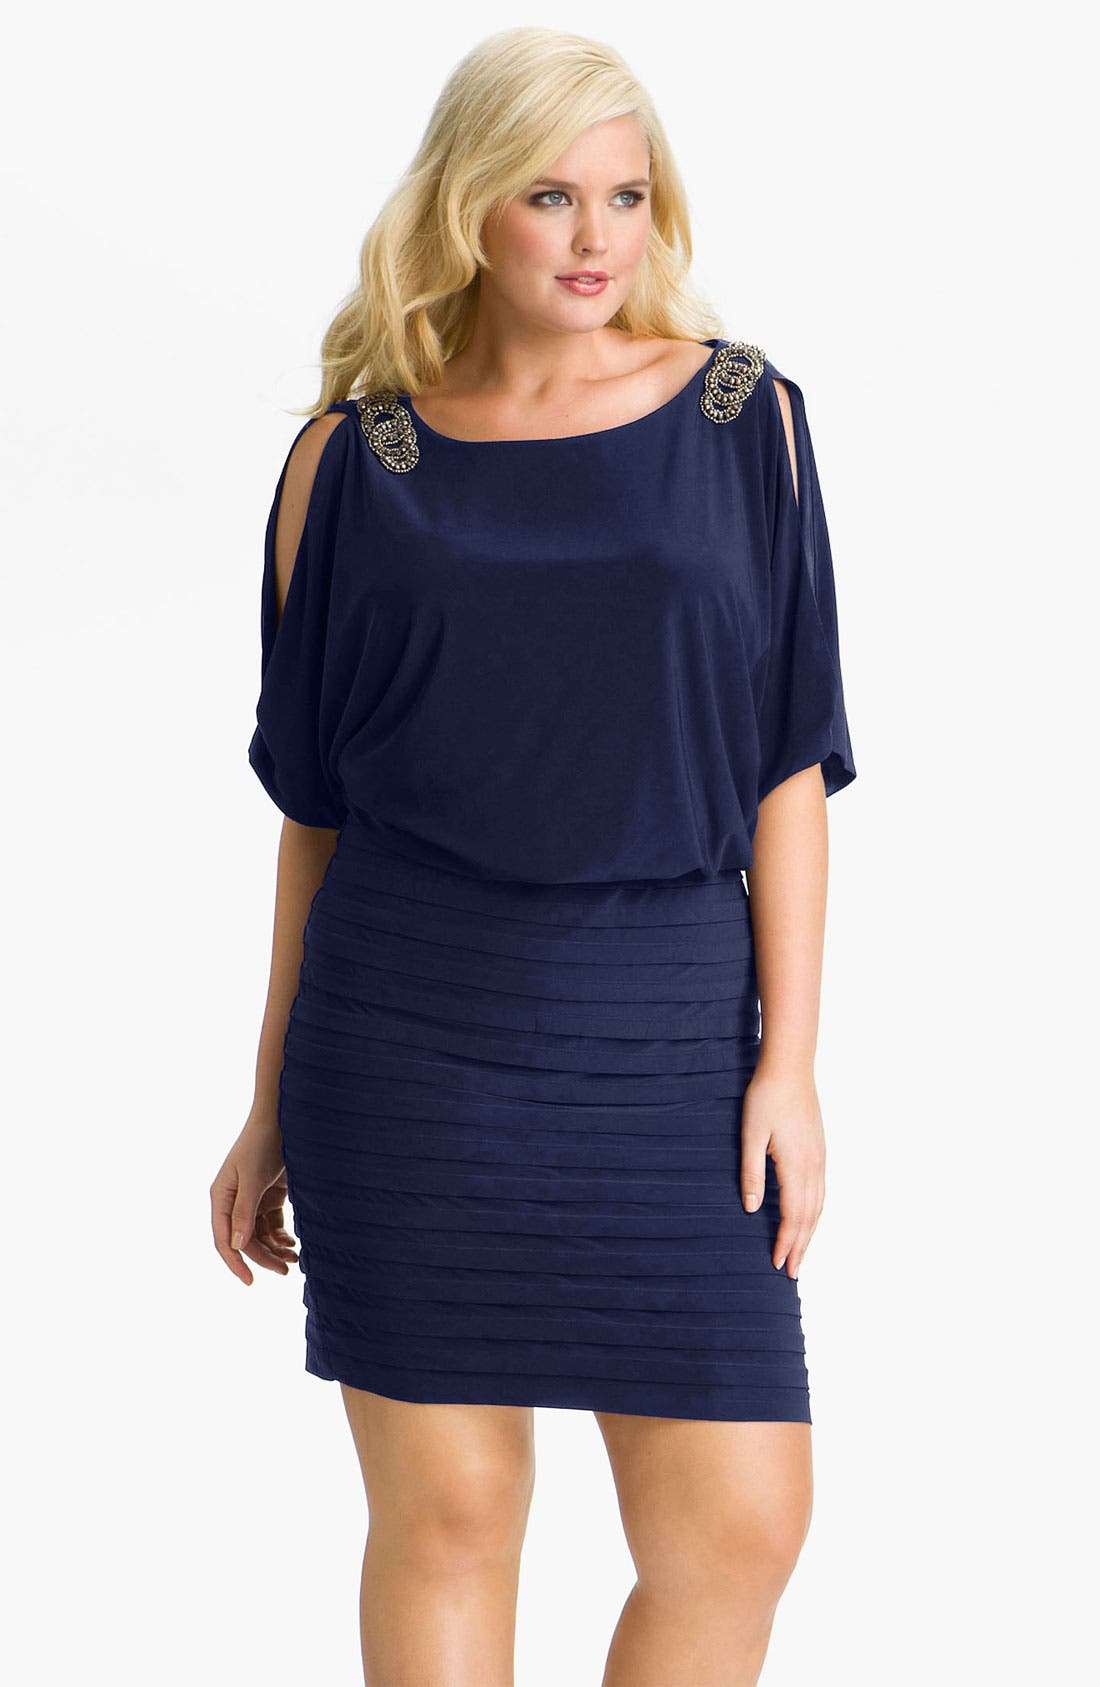 Alternate Image 1 Selected - Xscape Embellished Matte Jersey Blouson Dress (Plus)